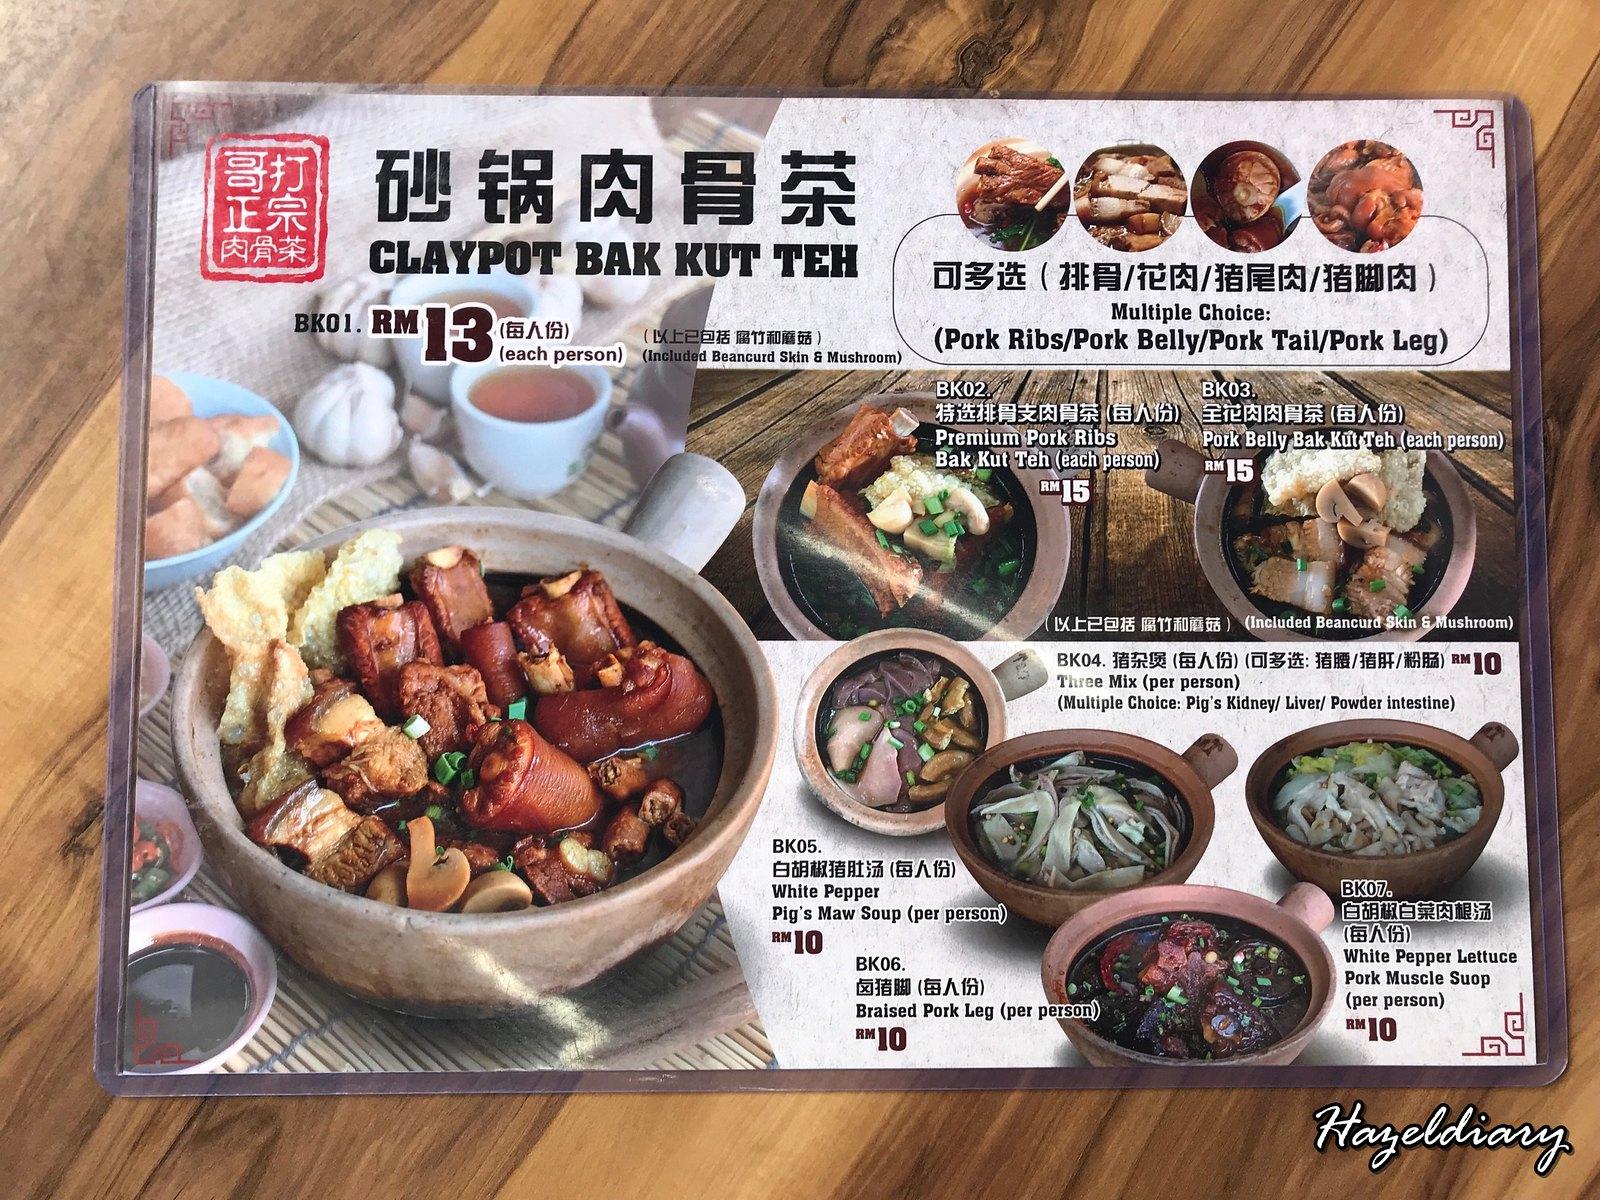 Restoran Kota Zheng Zhong-Bak Kut Teh-Hazeldiary-Menu